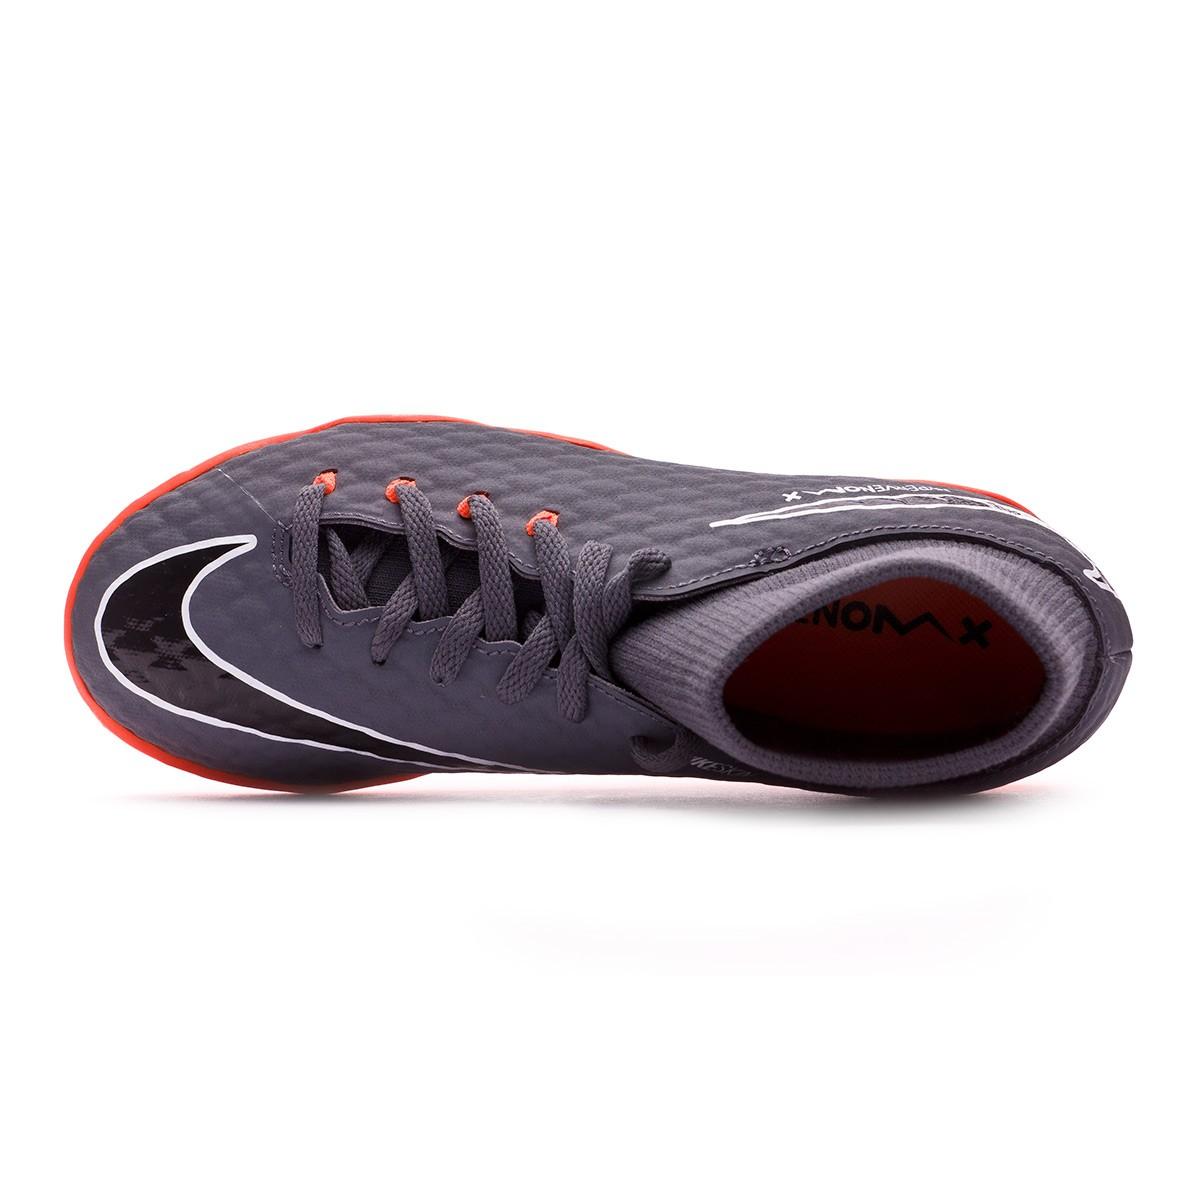 c87c191df553 Futsal Boot Nike Kids Hypervenom PhantomX III Academy DF IC Dark grey-Total  orange-White - Football store Fútbol Emotion